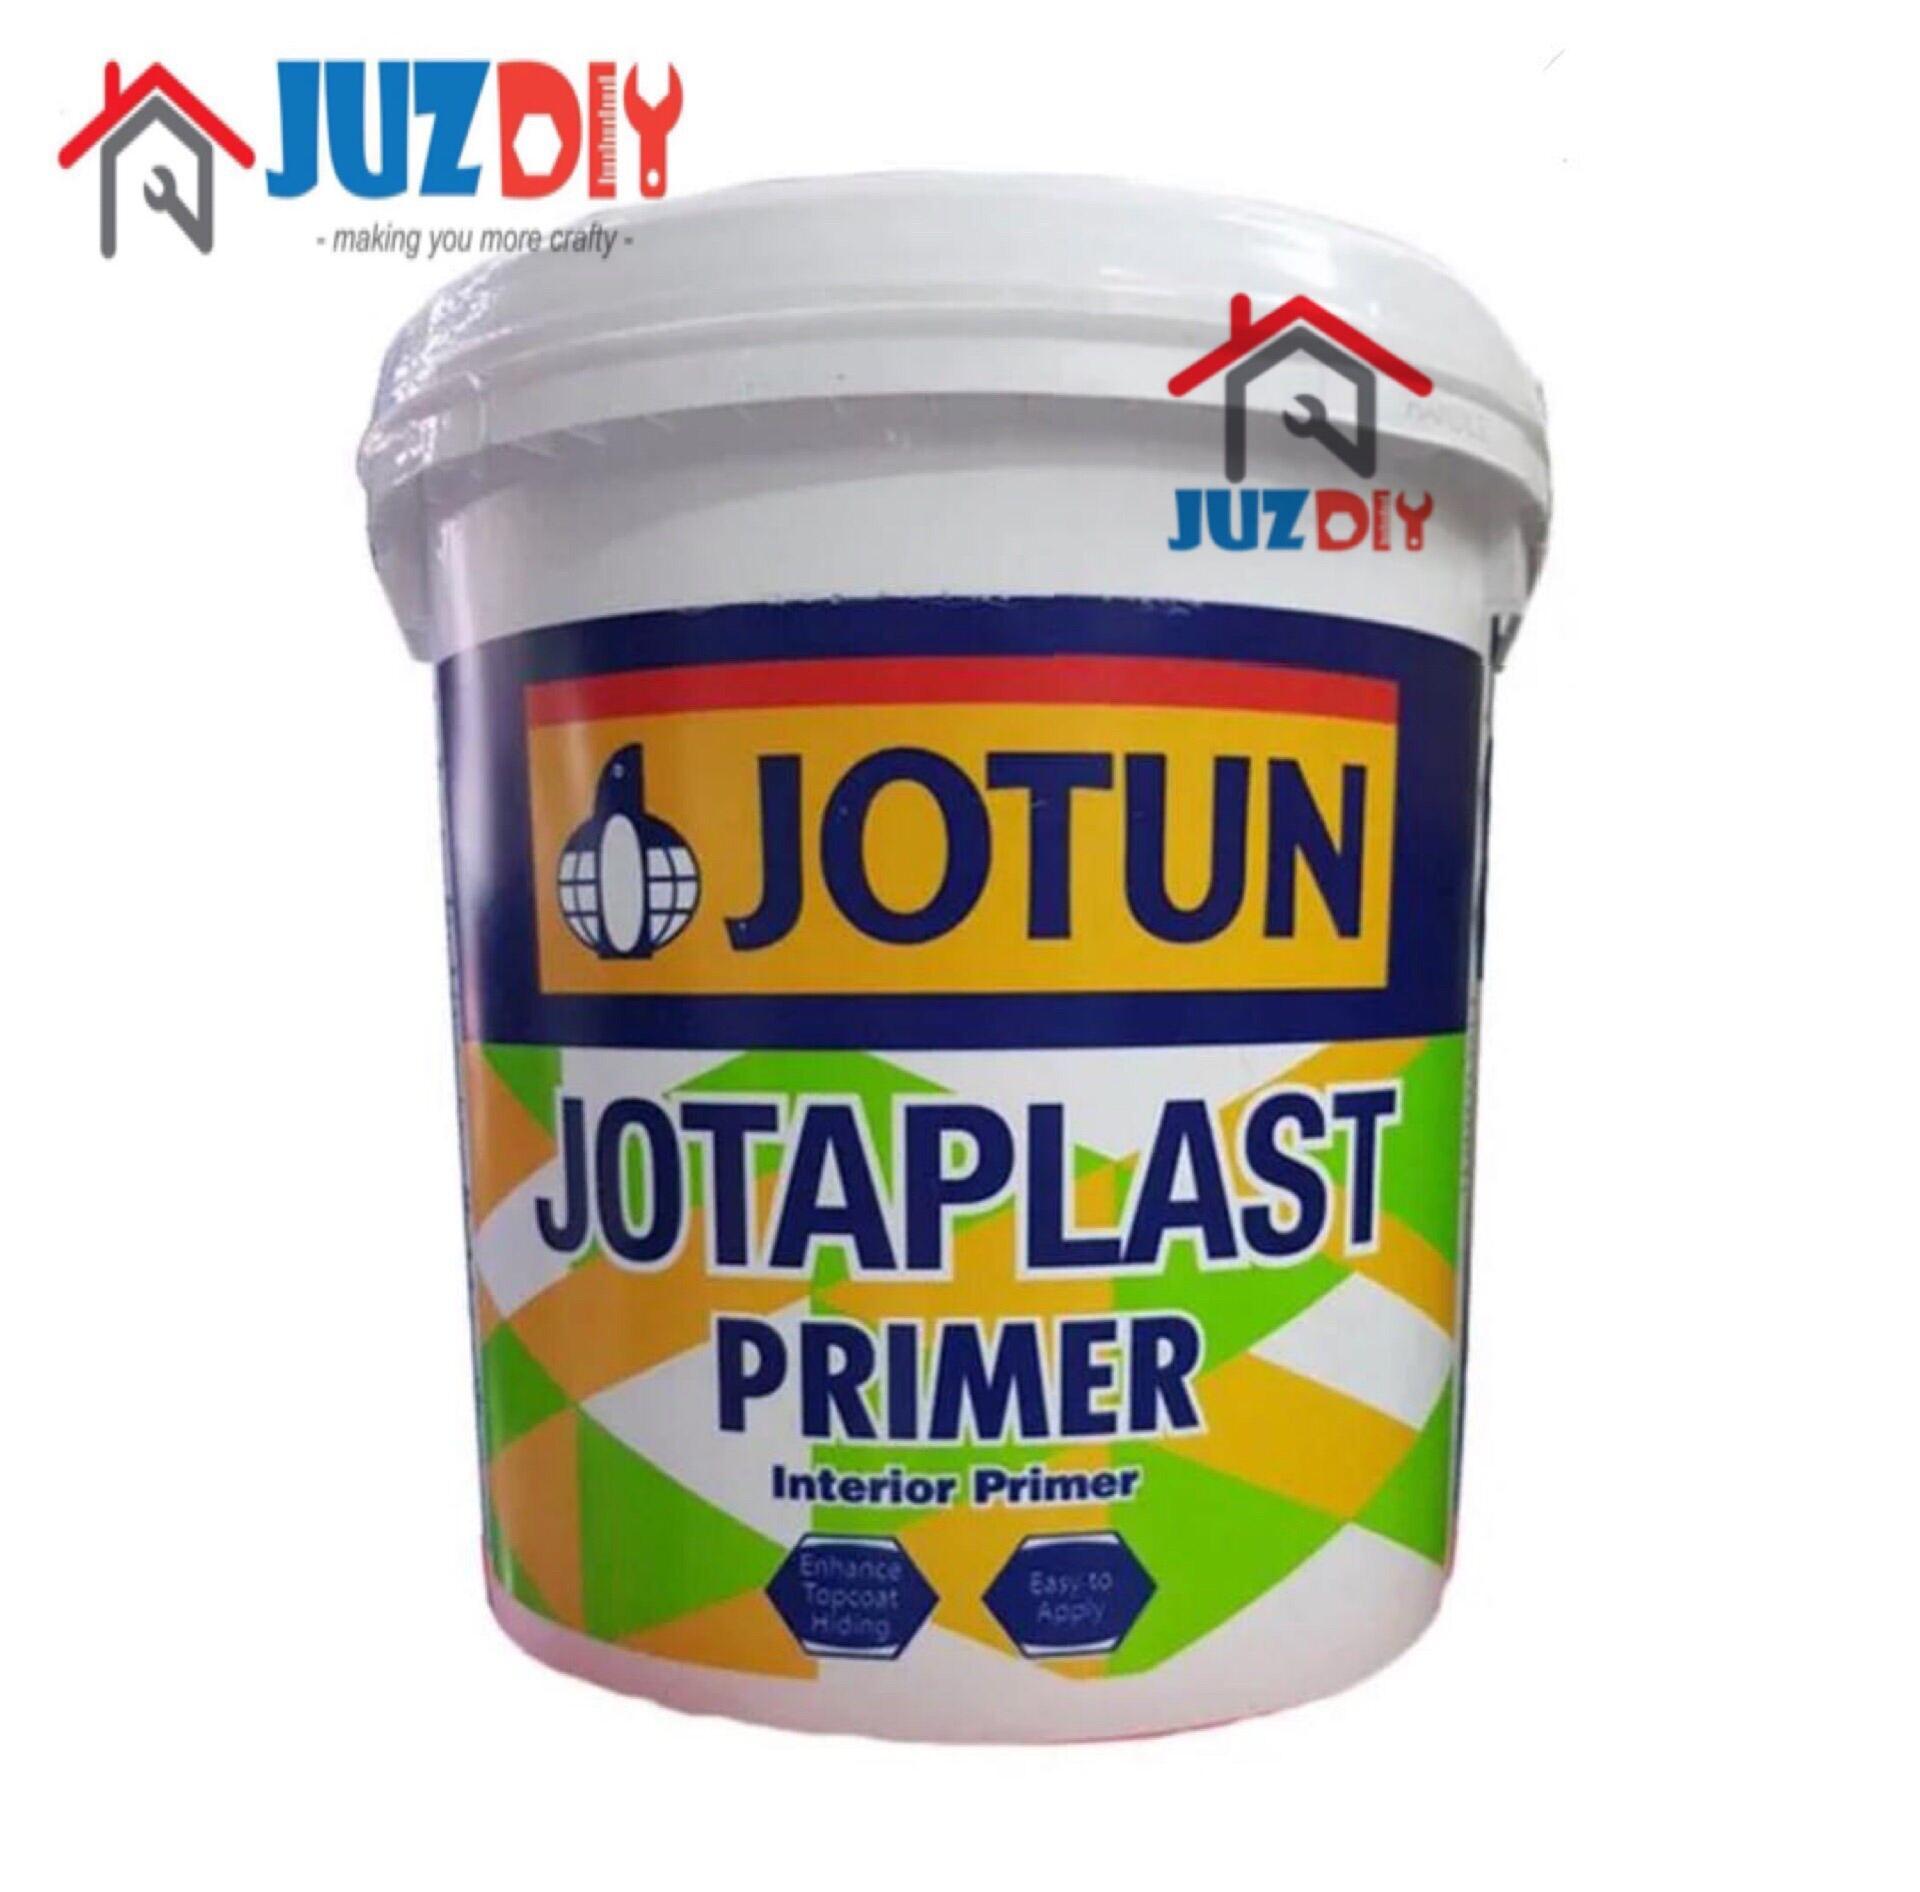 JOTUN Jotaplast Primer 20L # Interior Wall Sealer #